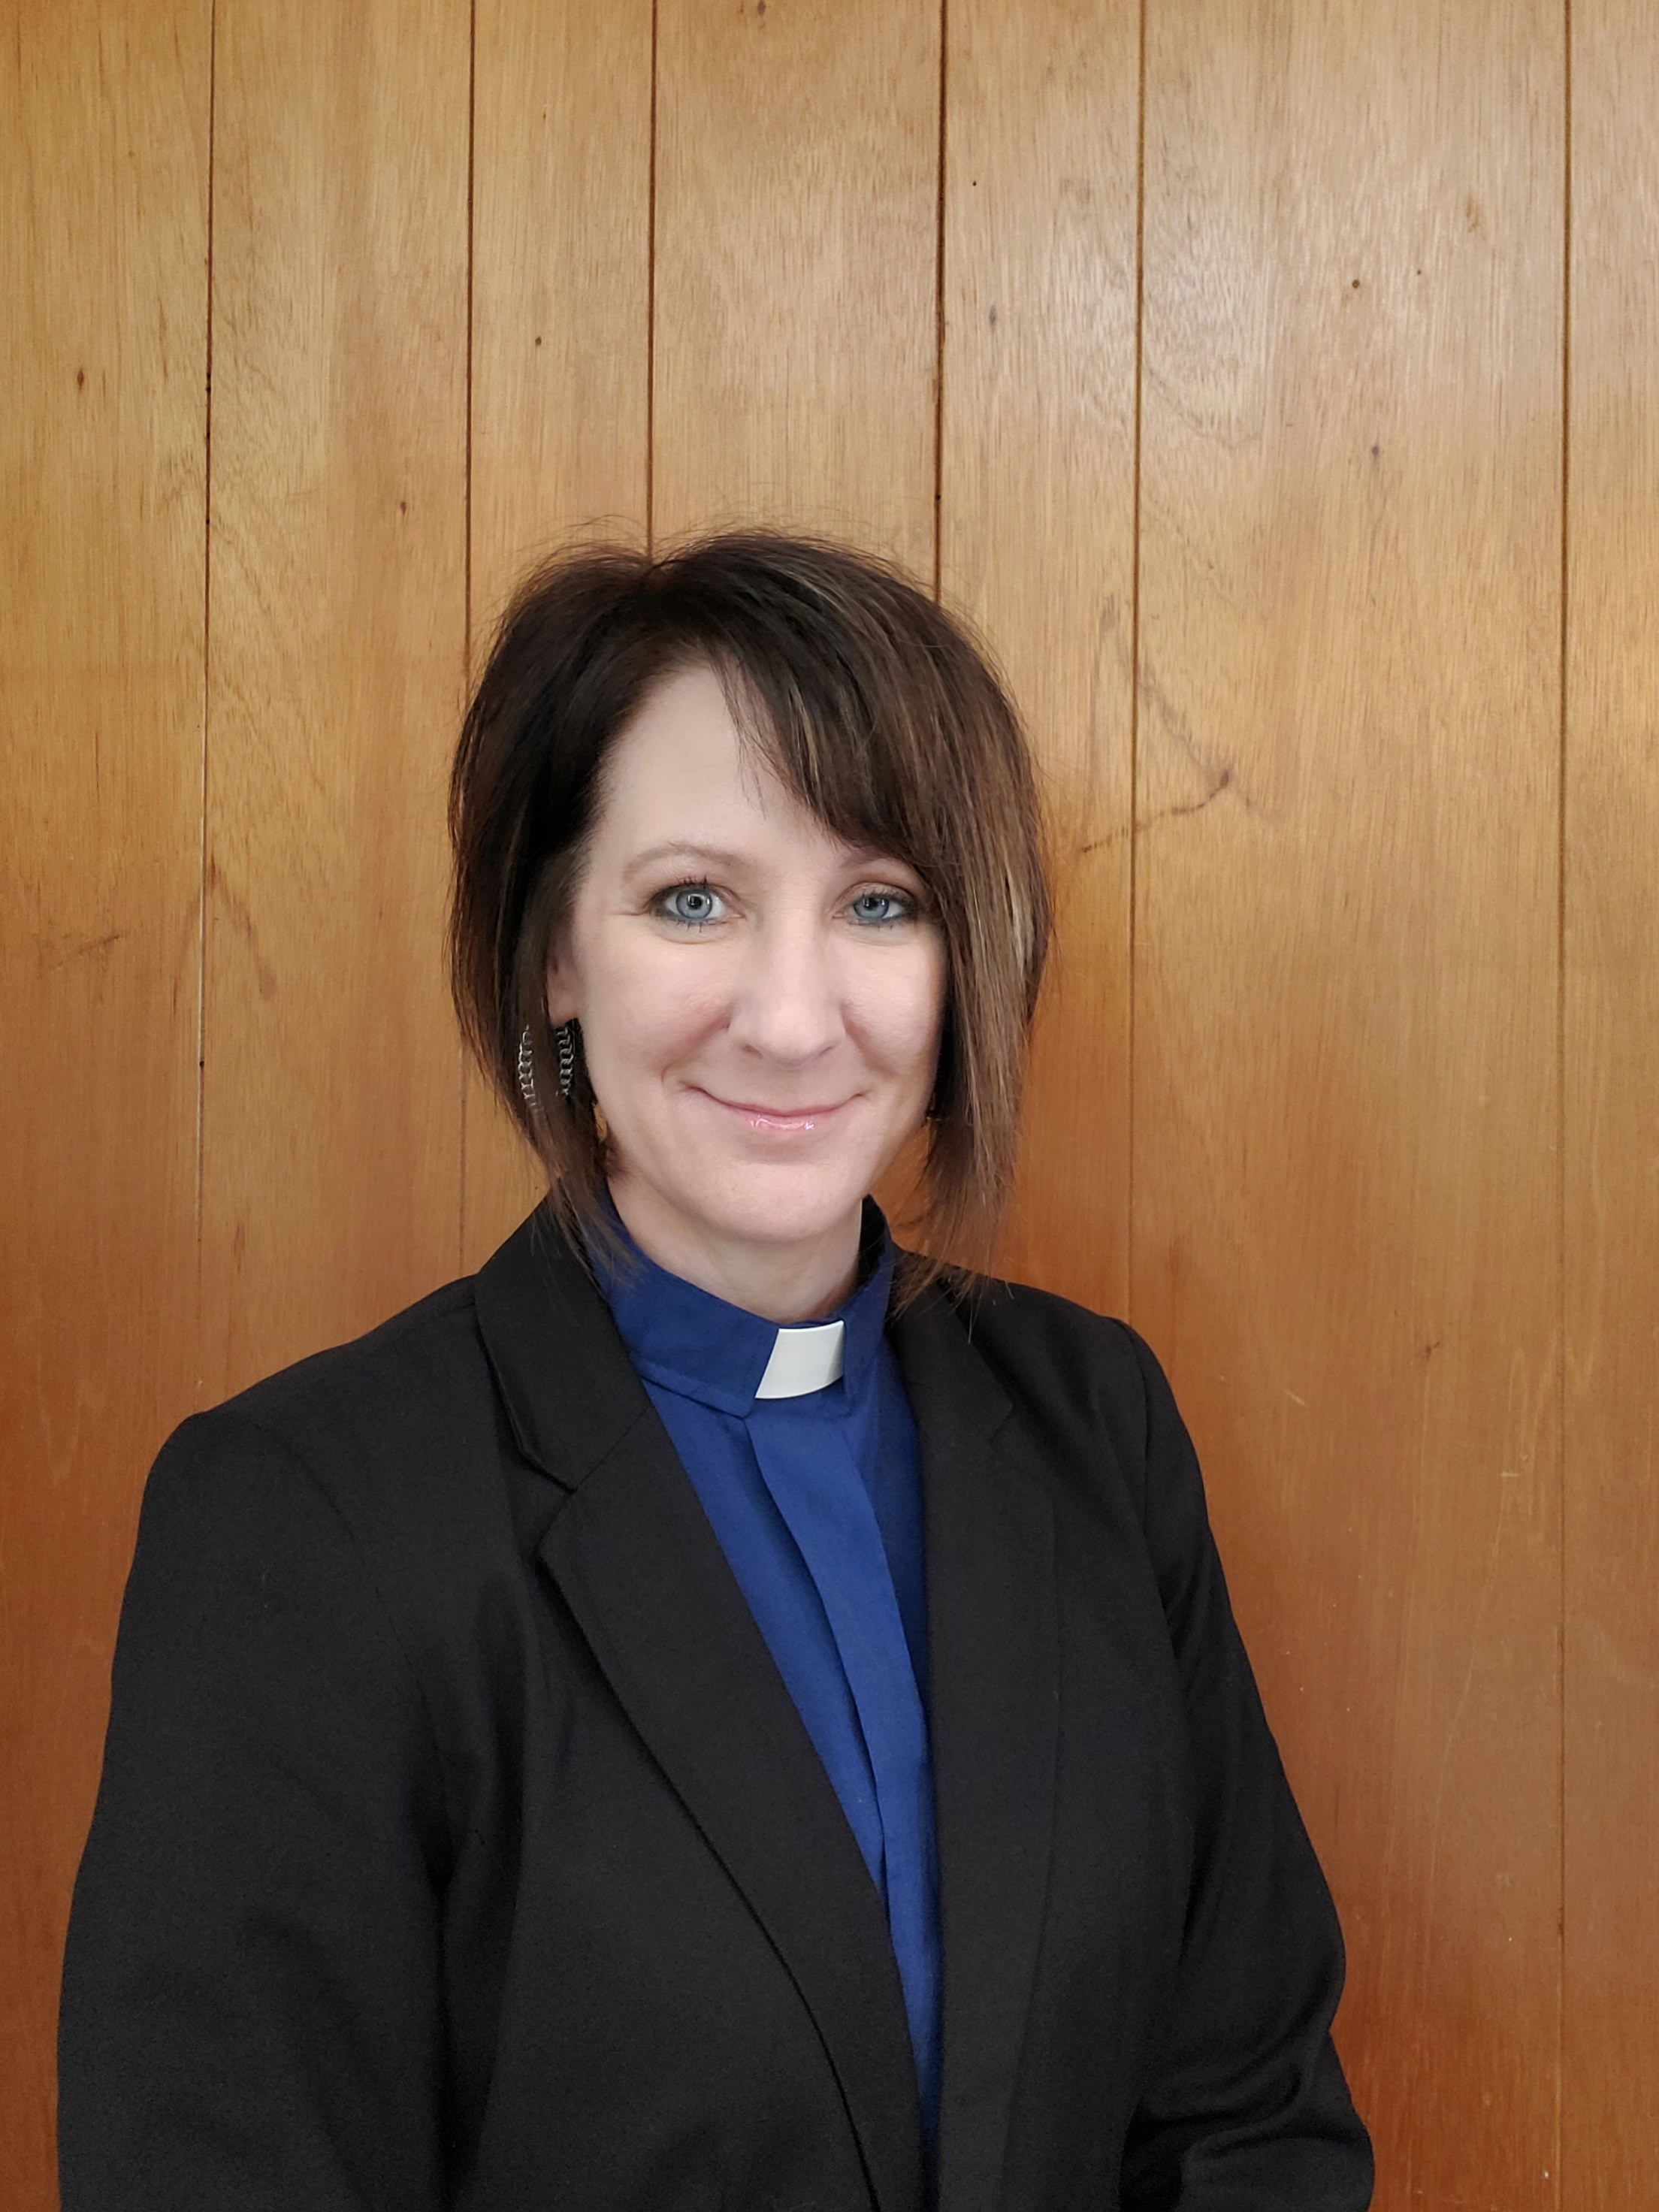 Pastor Shellie Knight